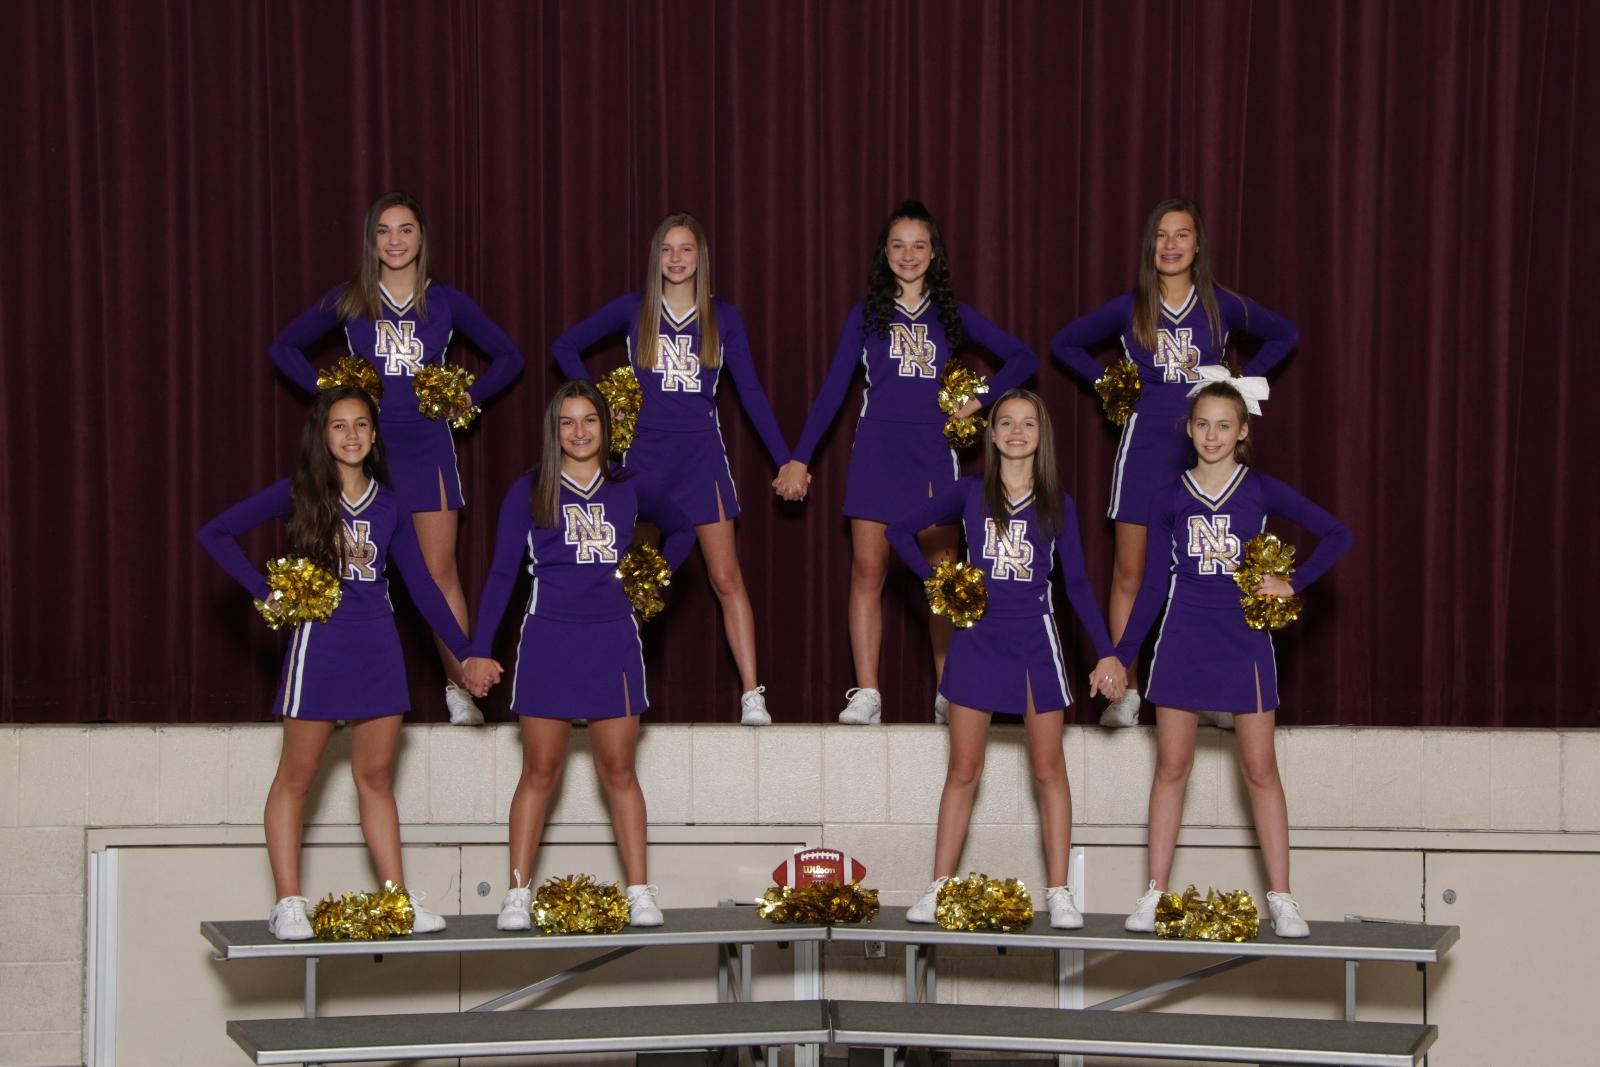 MS Girls 8th Grade Cheerleading – 2018 Fall Sports Awards Winners